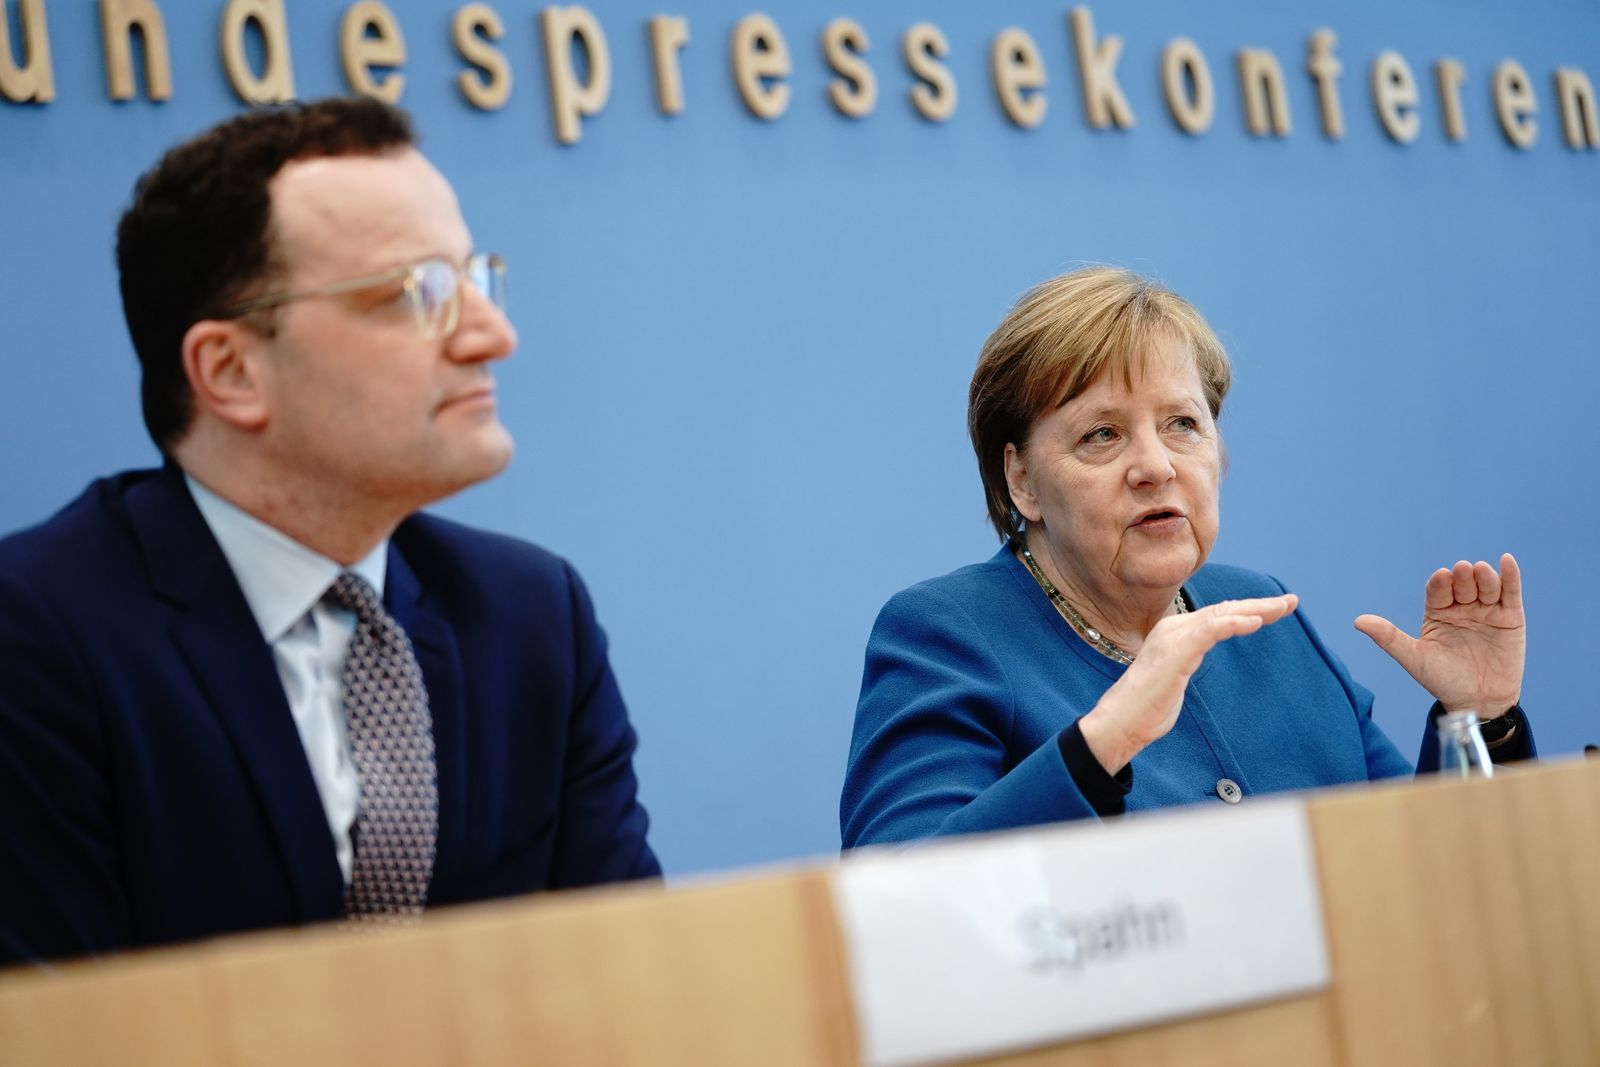 Angela Merkel / Jens Spahn / Coronavirus